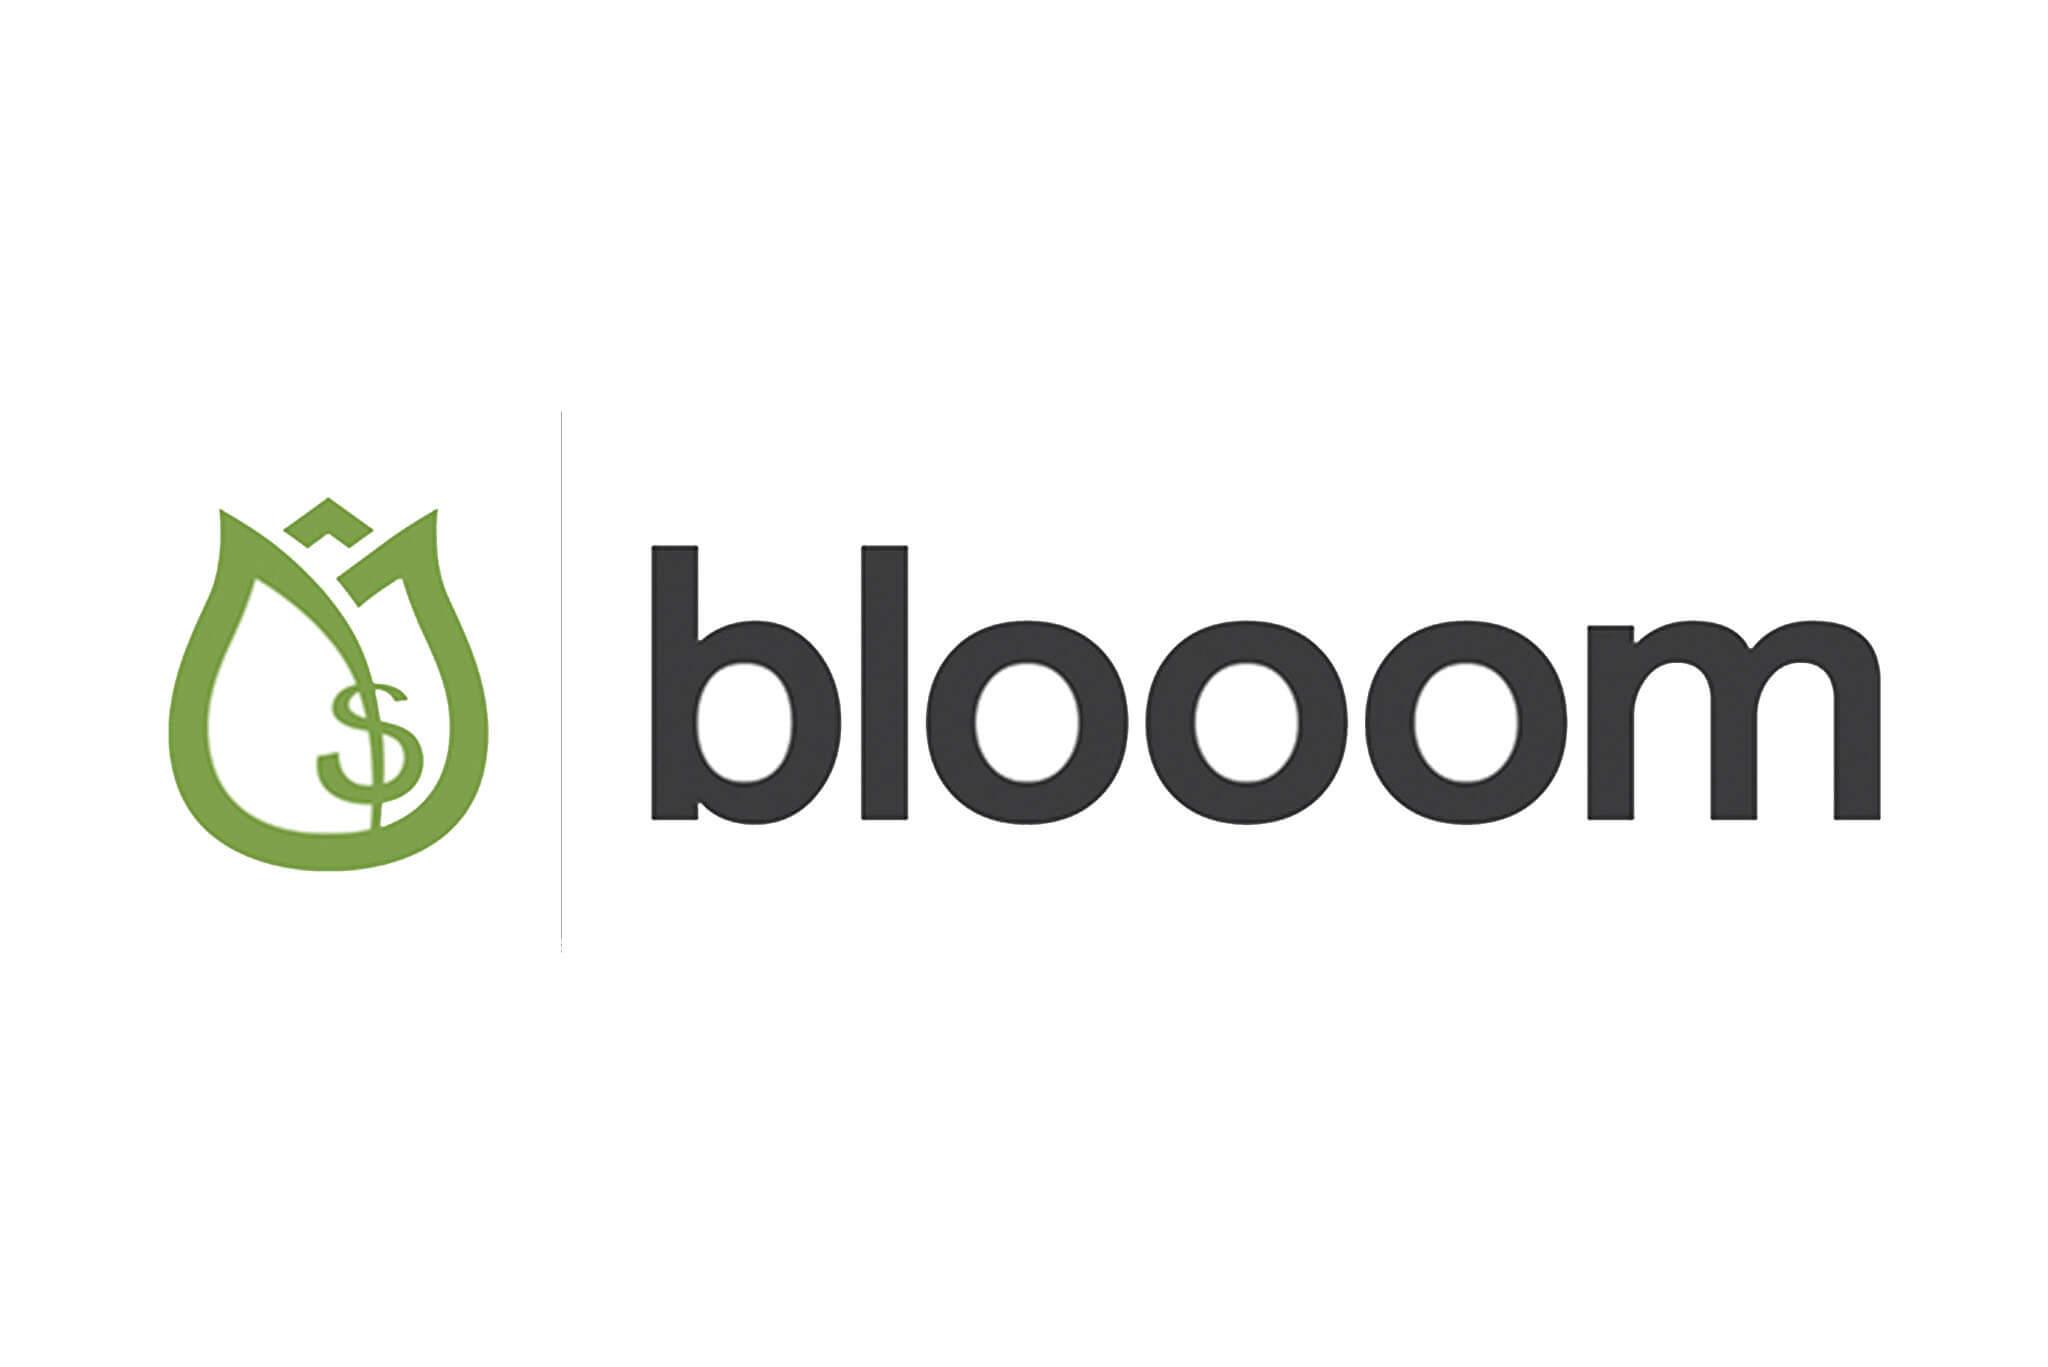 Blooom review 401k